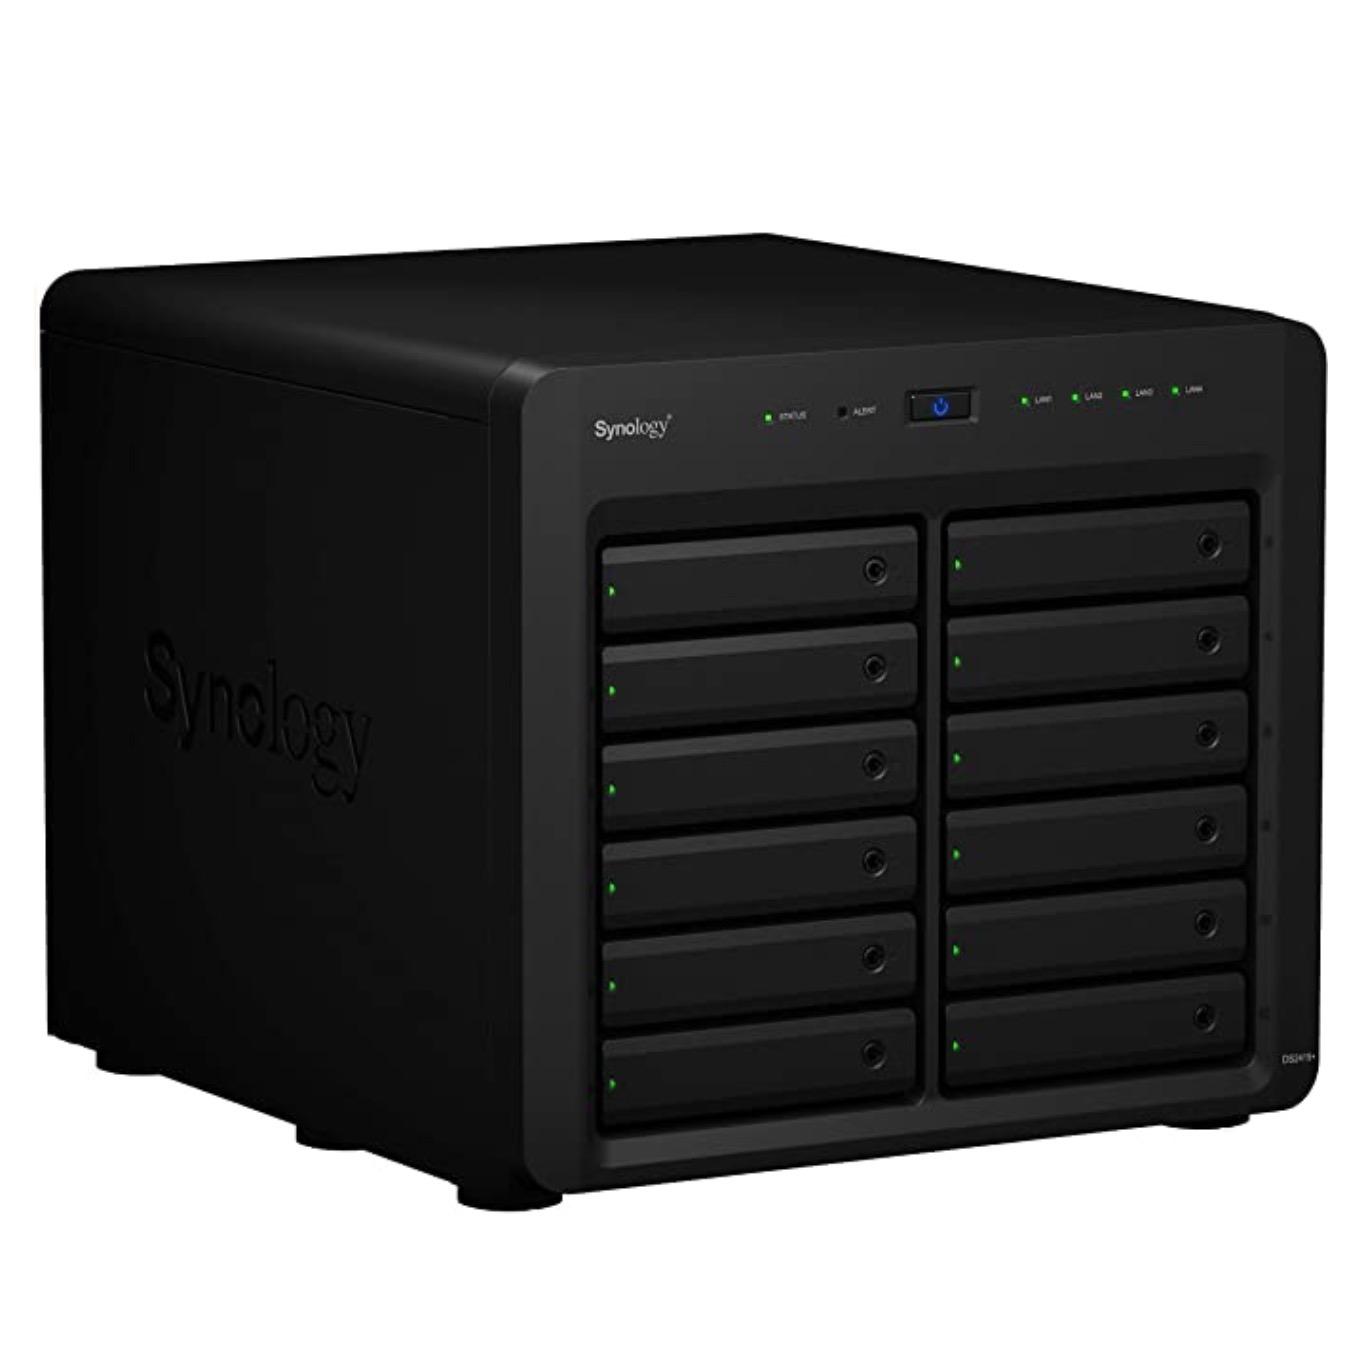 Synology 群晖 DS2419+ 12盘位NAS (C3538、4GB)